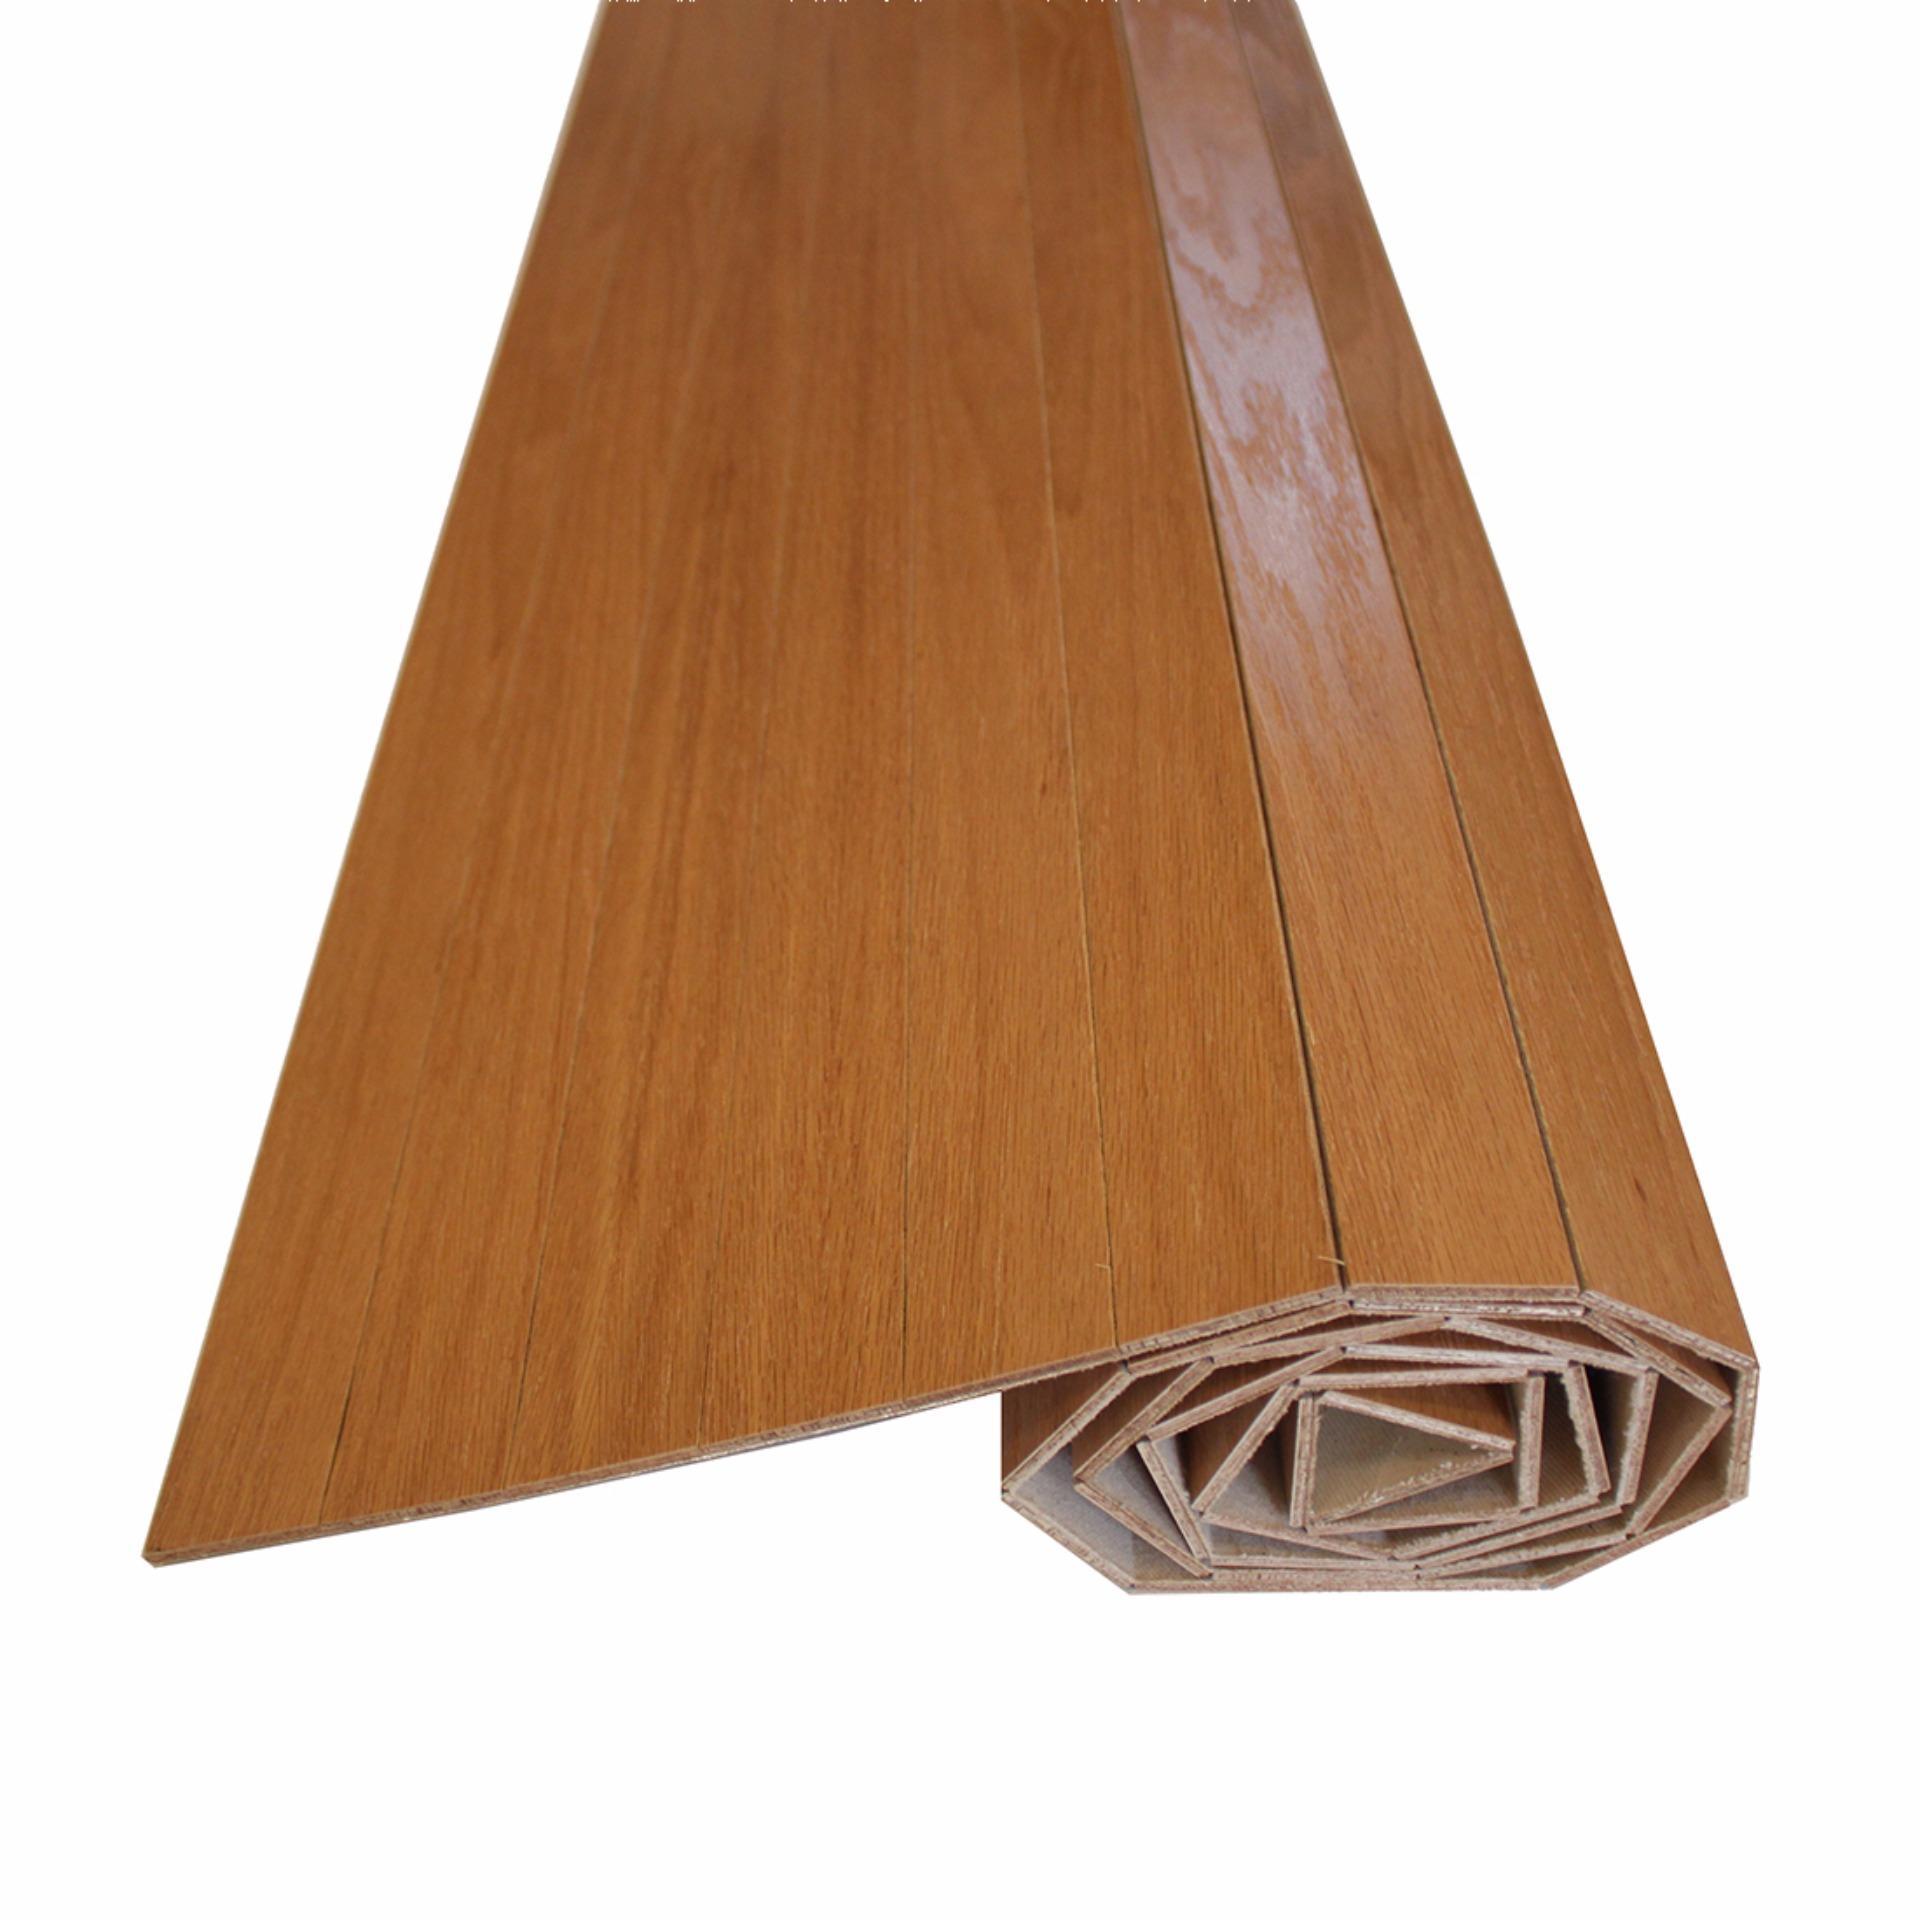 182cm x 245cm - Karpet Kayu Plywood / Wood Carpet Gulung Lapisan Veneer - Light Brown - United Goods